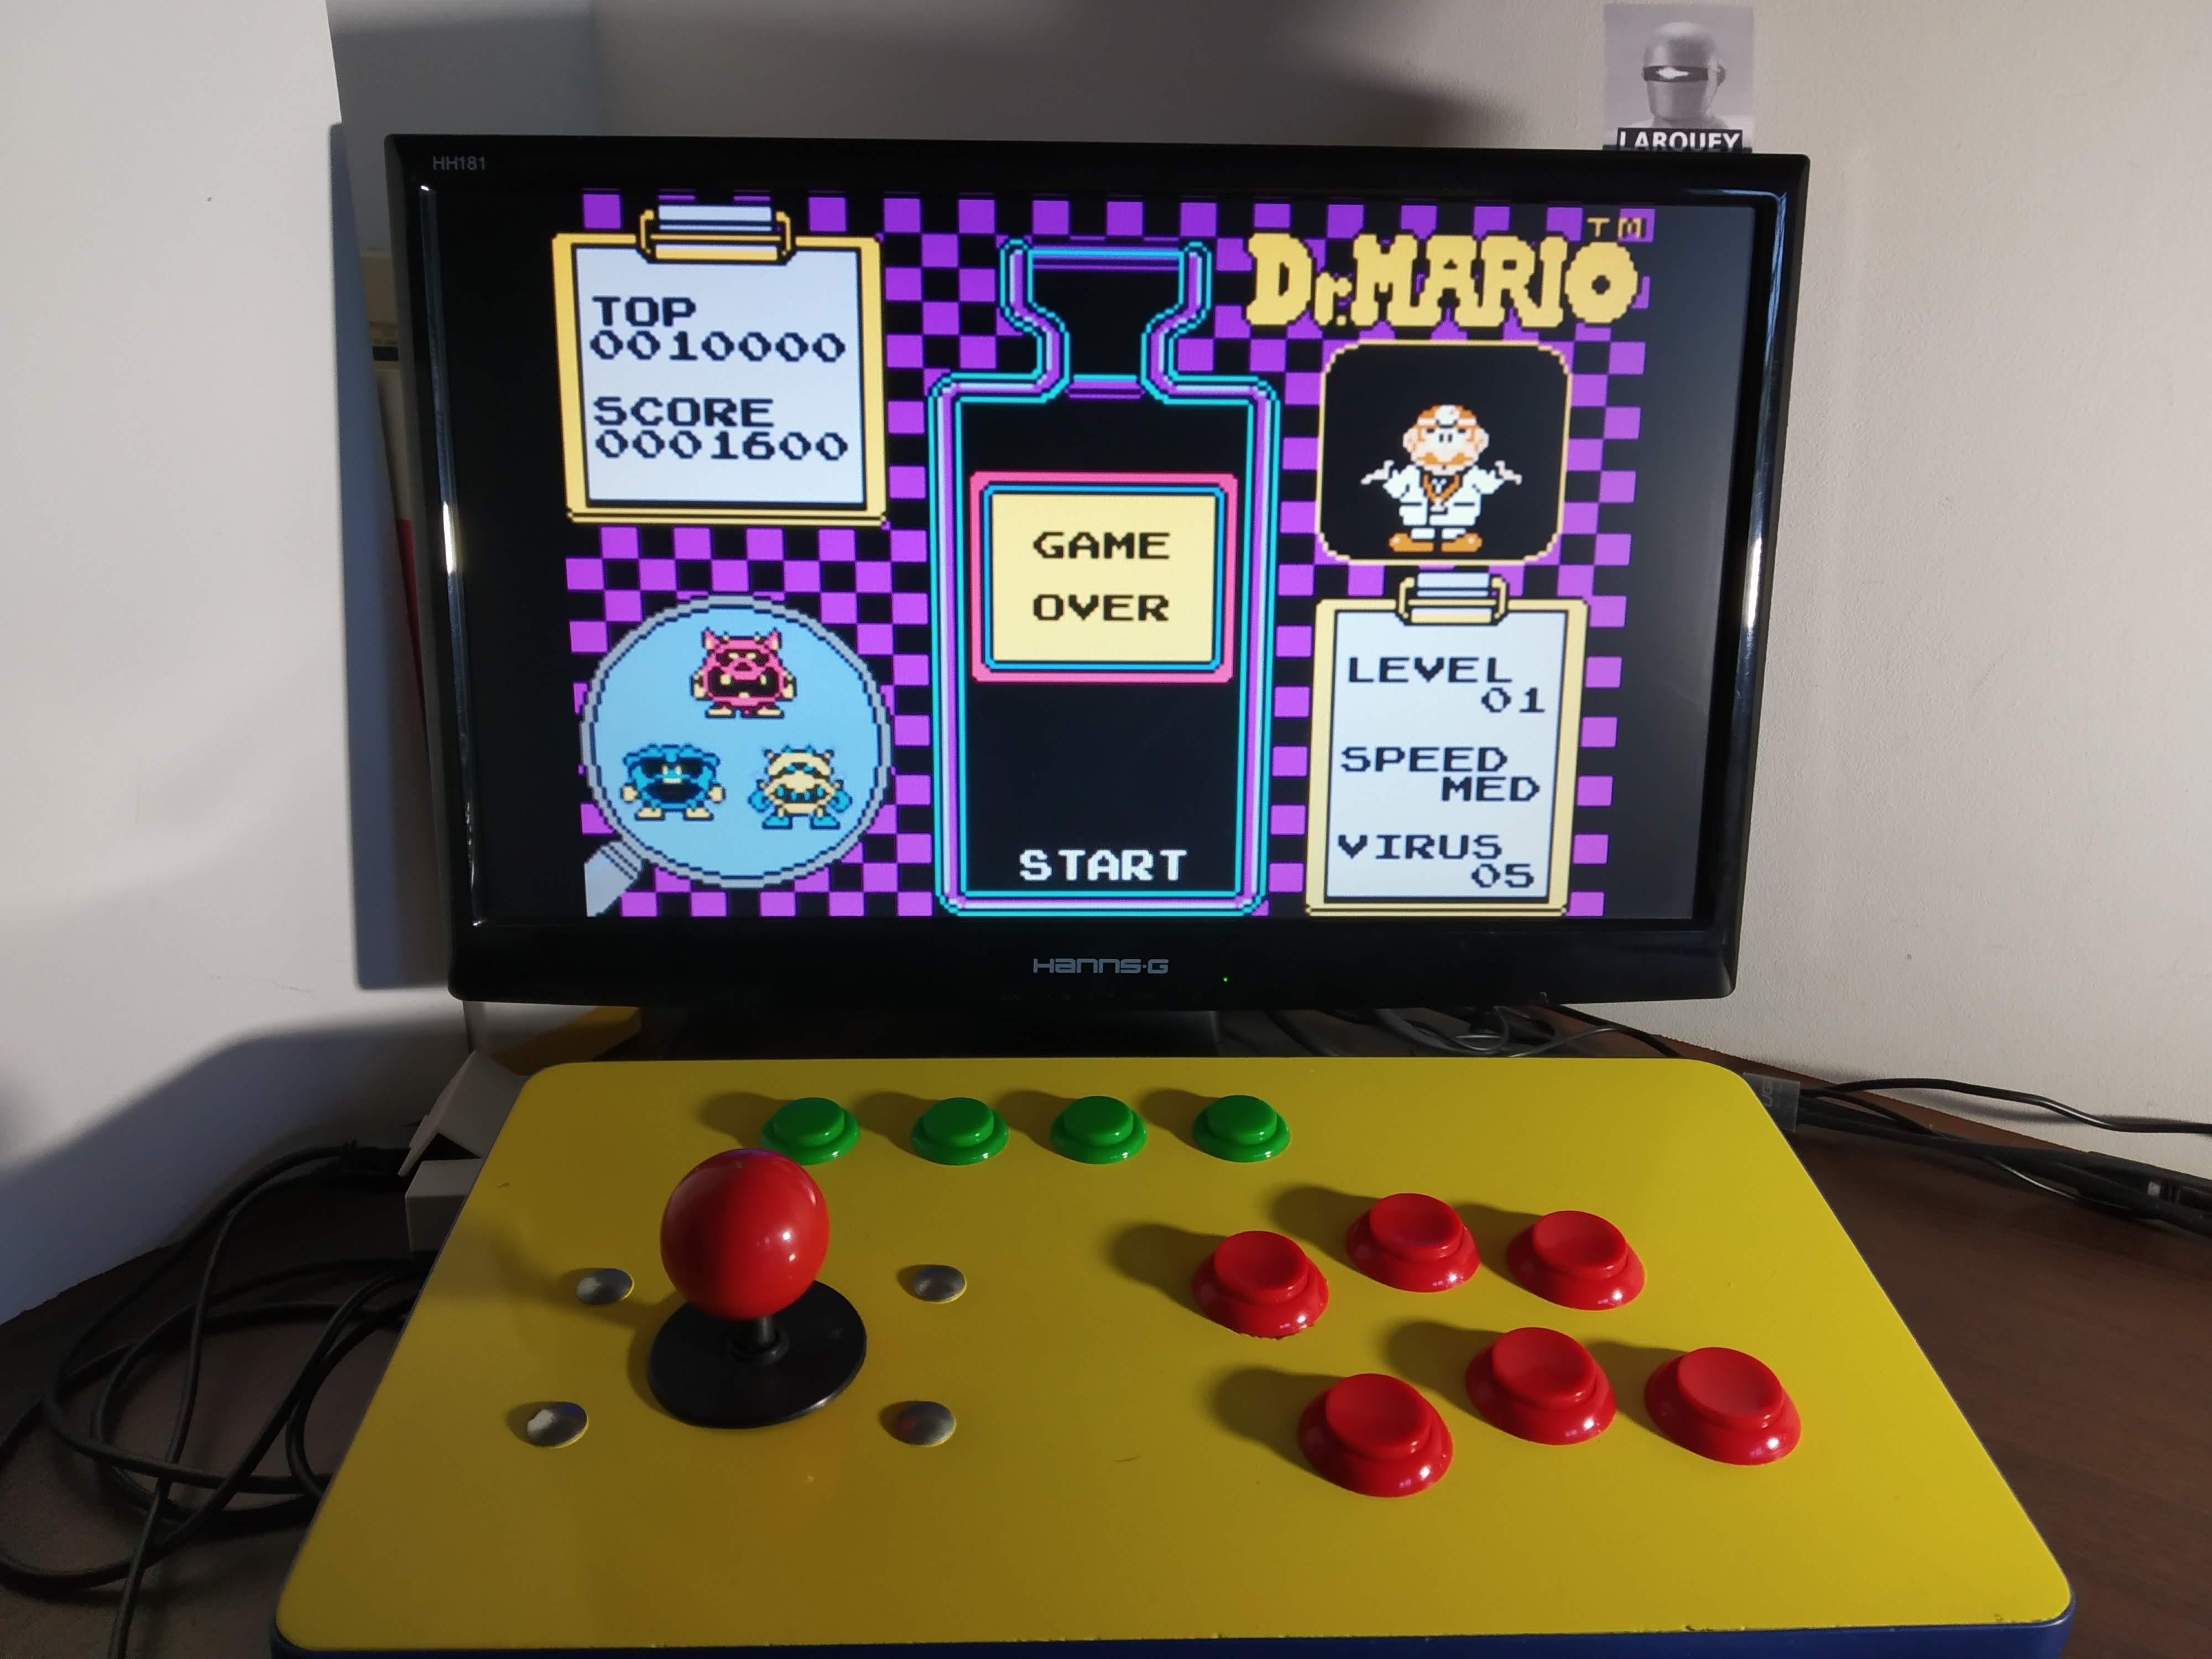 Larquey: Famicom Mini Vol. 15: Dr. Mario (GBA Emulated) 1,600 points on 2019-12-21 16:13:22